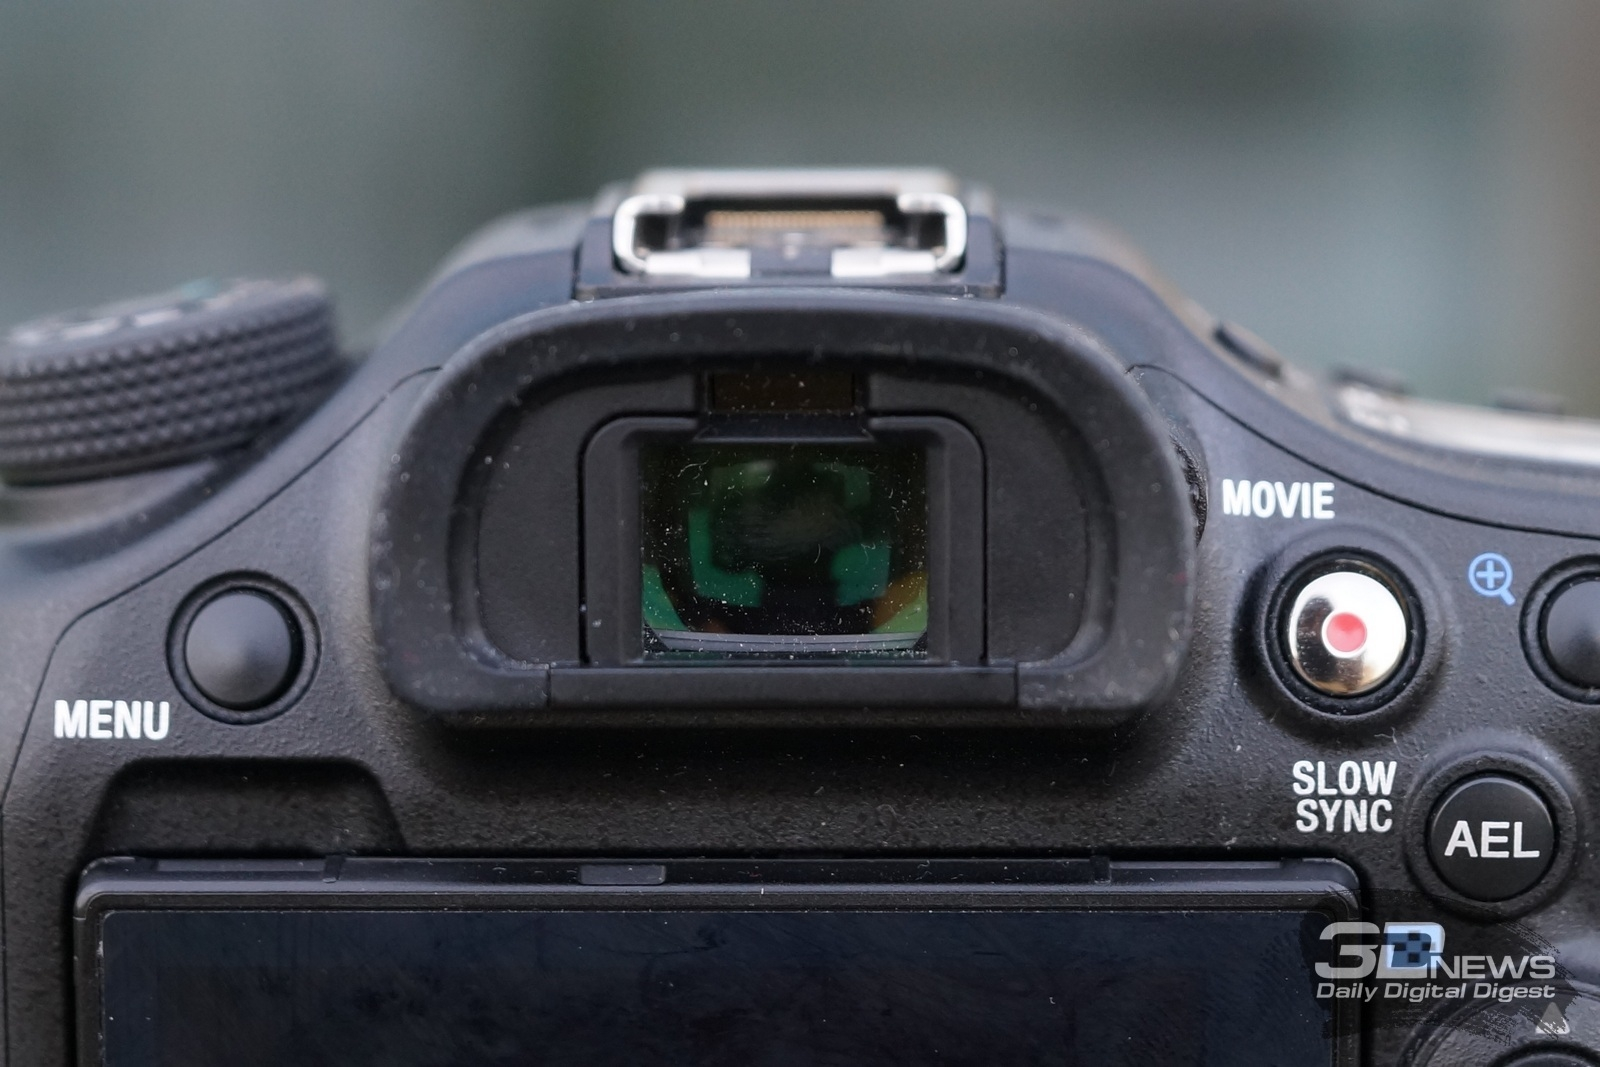 Assistenza fotocamere sony roma 31